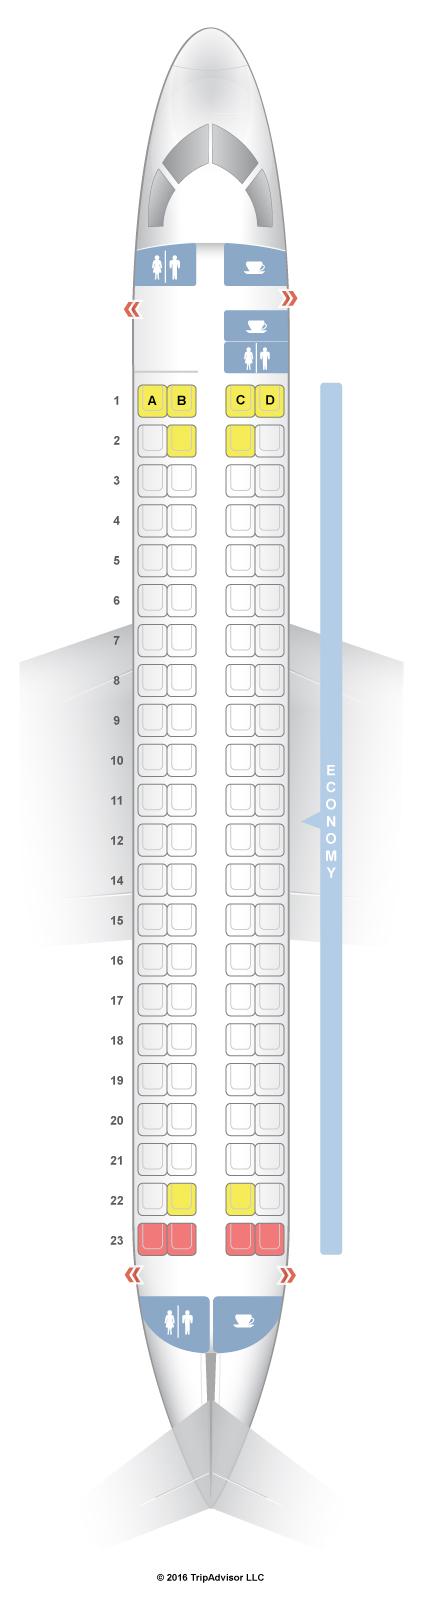 Seatguru Seat Map Flybe Embraer 175 E75